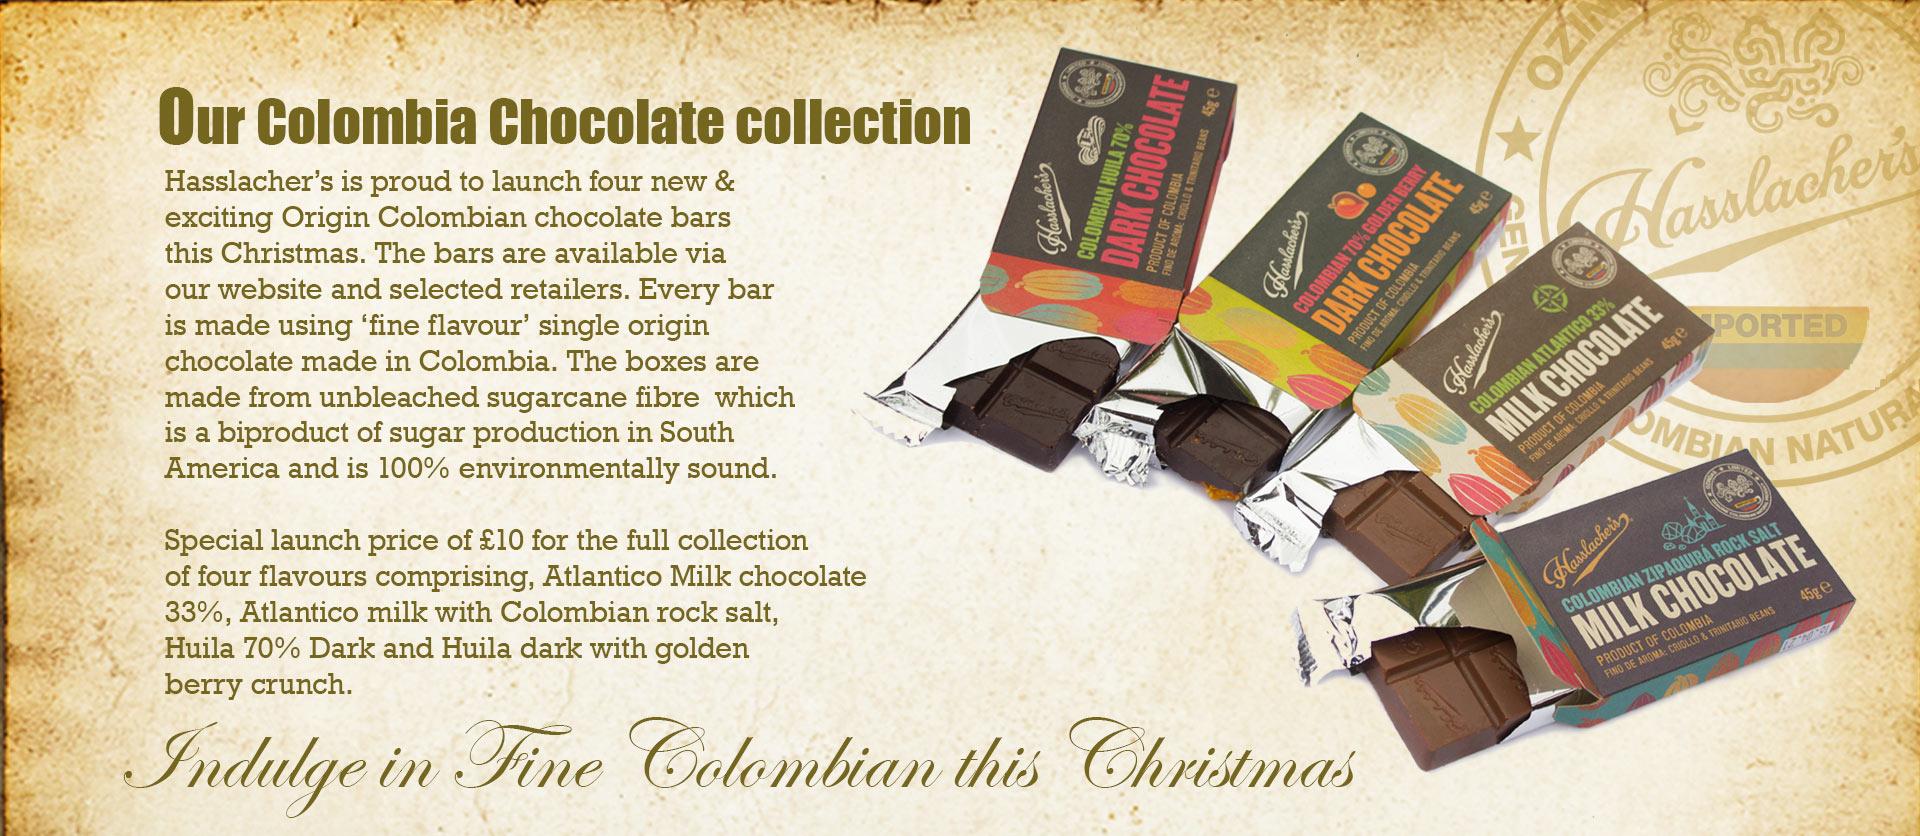 Hasslachers Colombian Chocolate